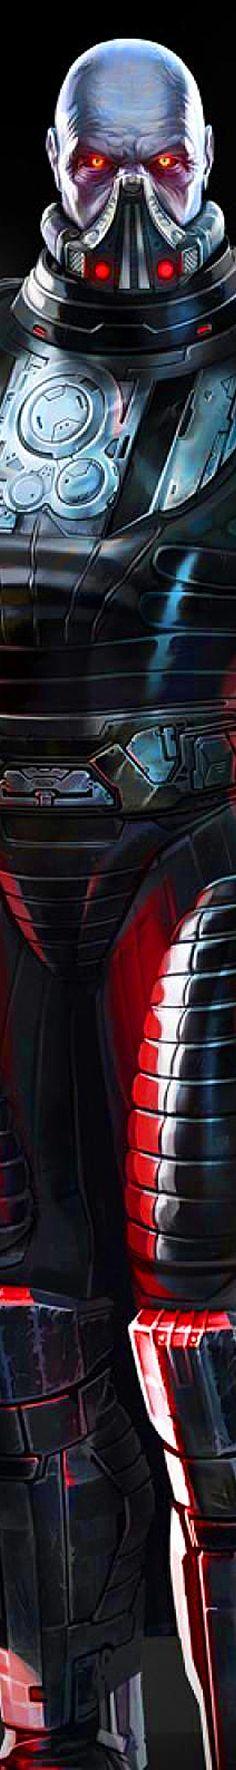 Star Wars - Sith Warrior Old Republic